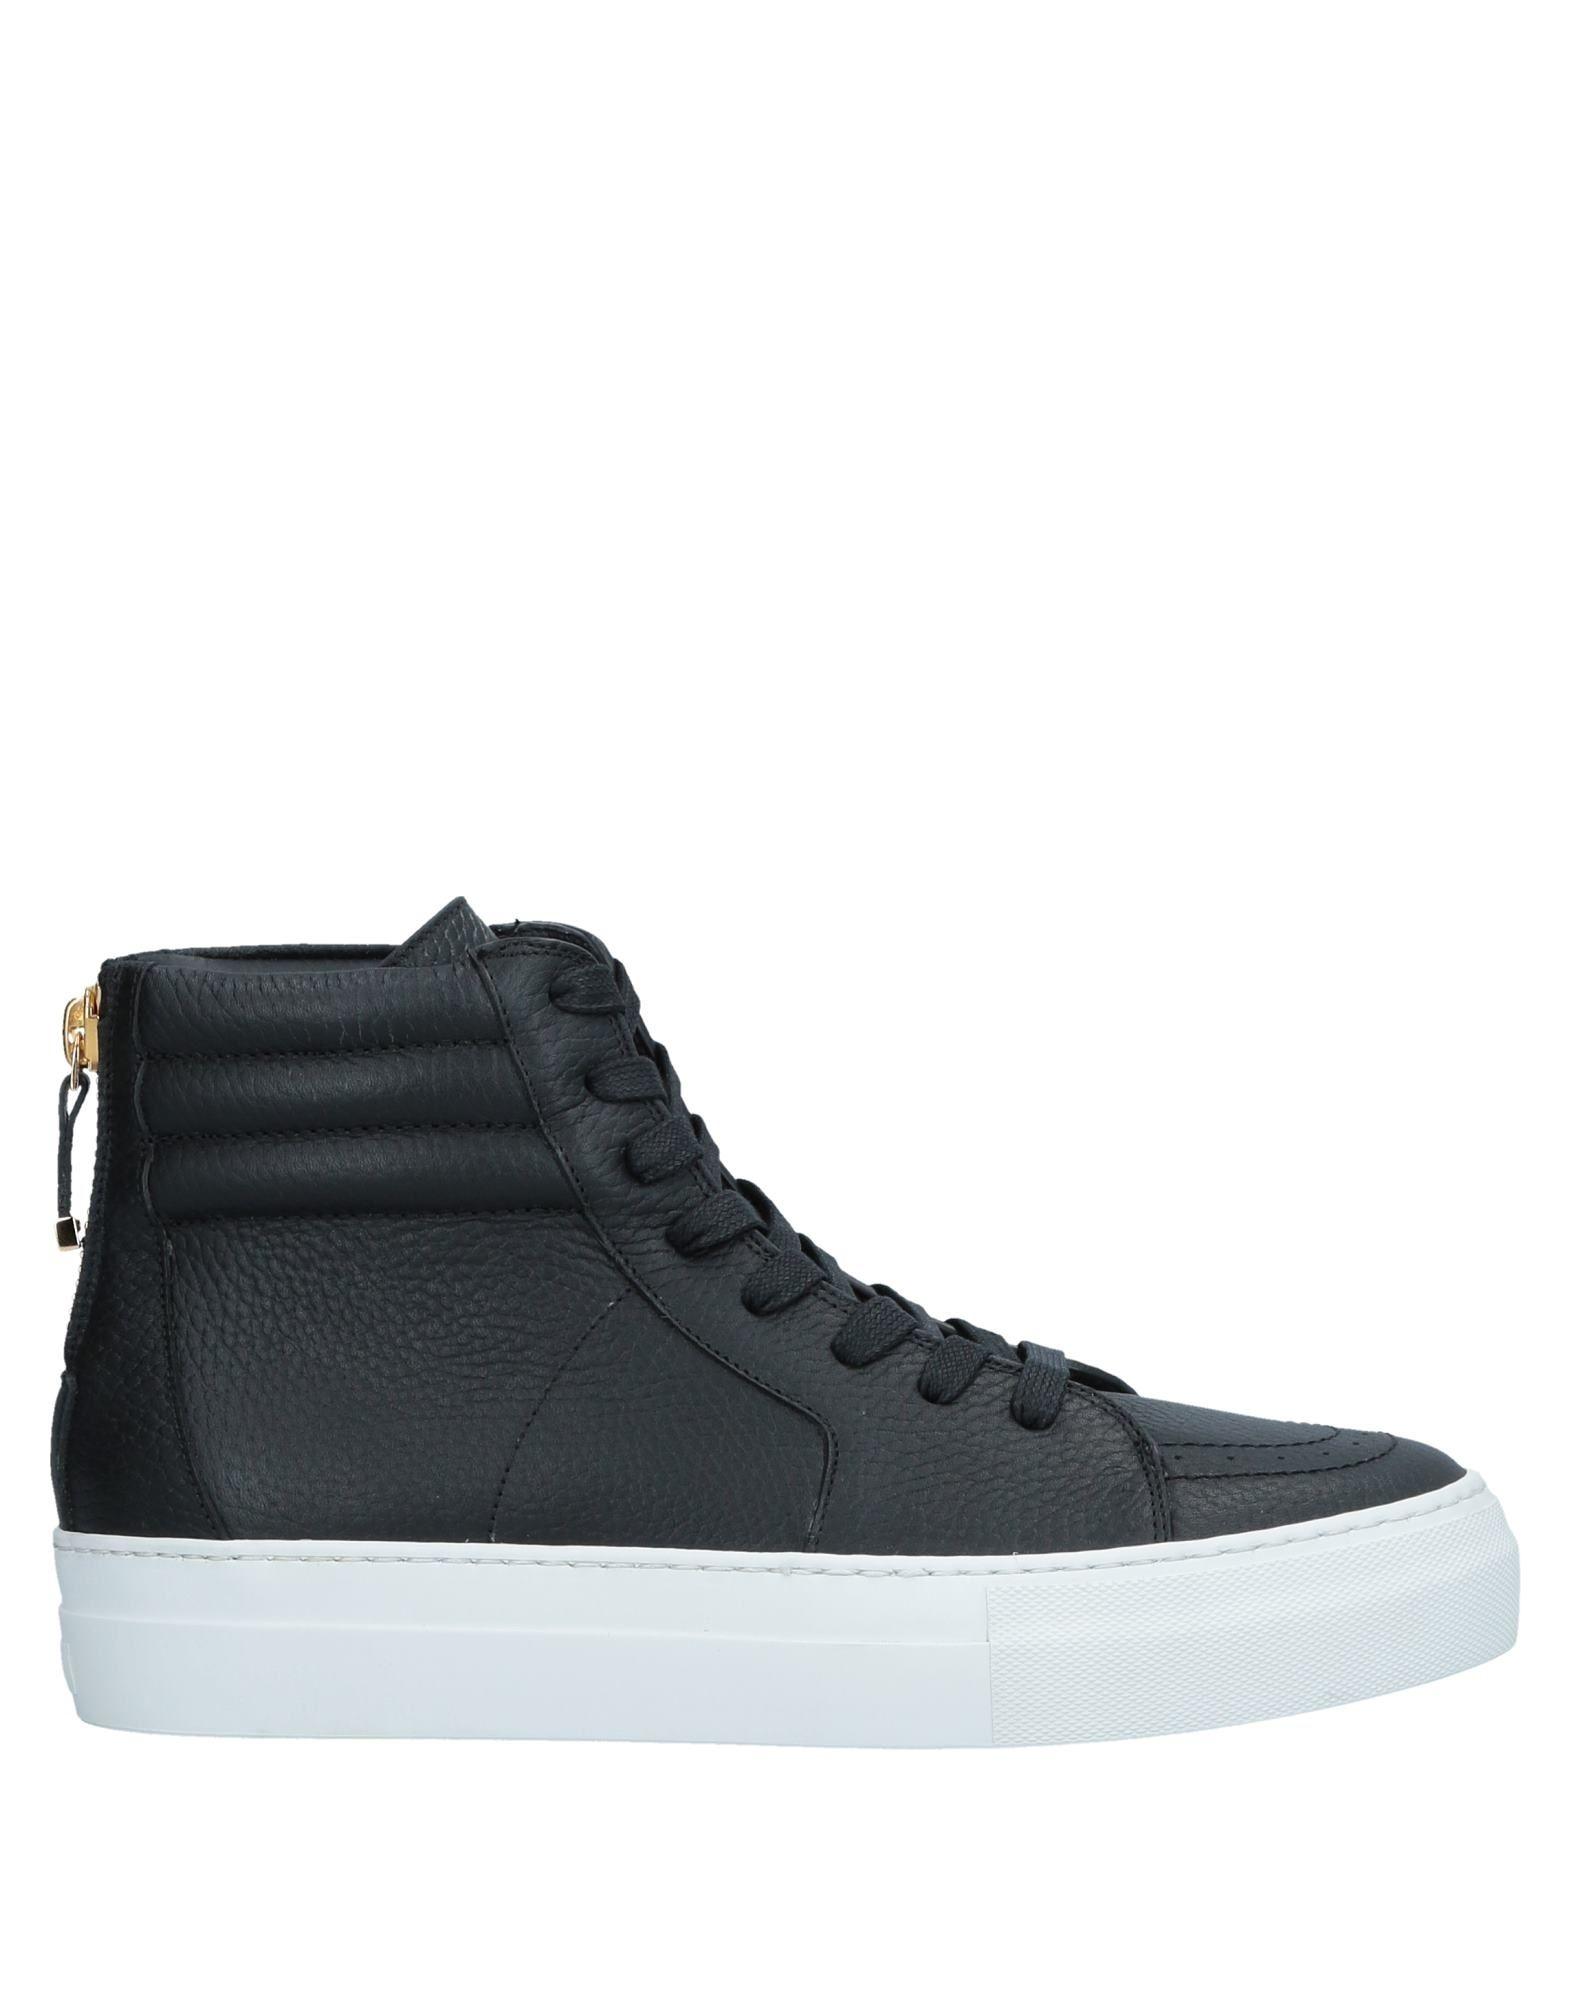 Buscemi Sneakers Herren Qualität  11525488JM Gute Qualität Herren beliebte Schuhe 5798f6